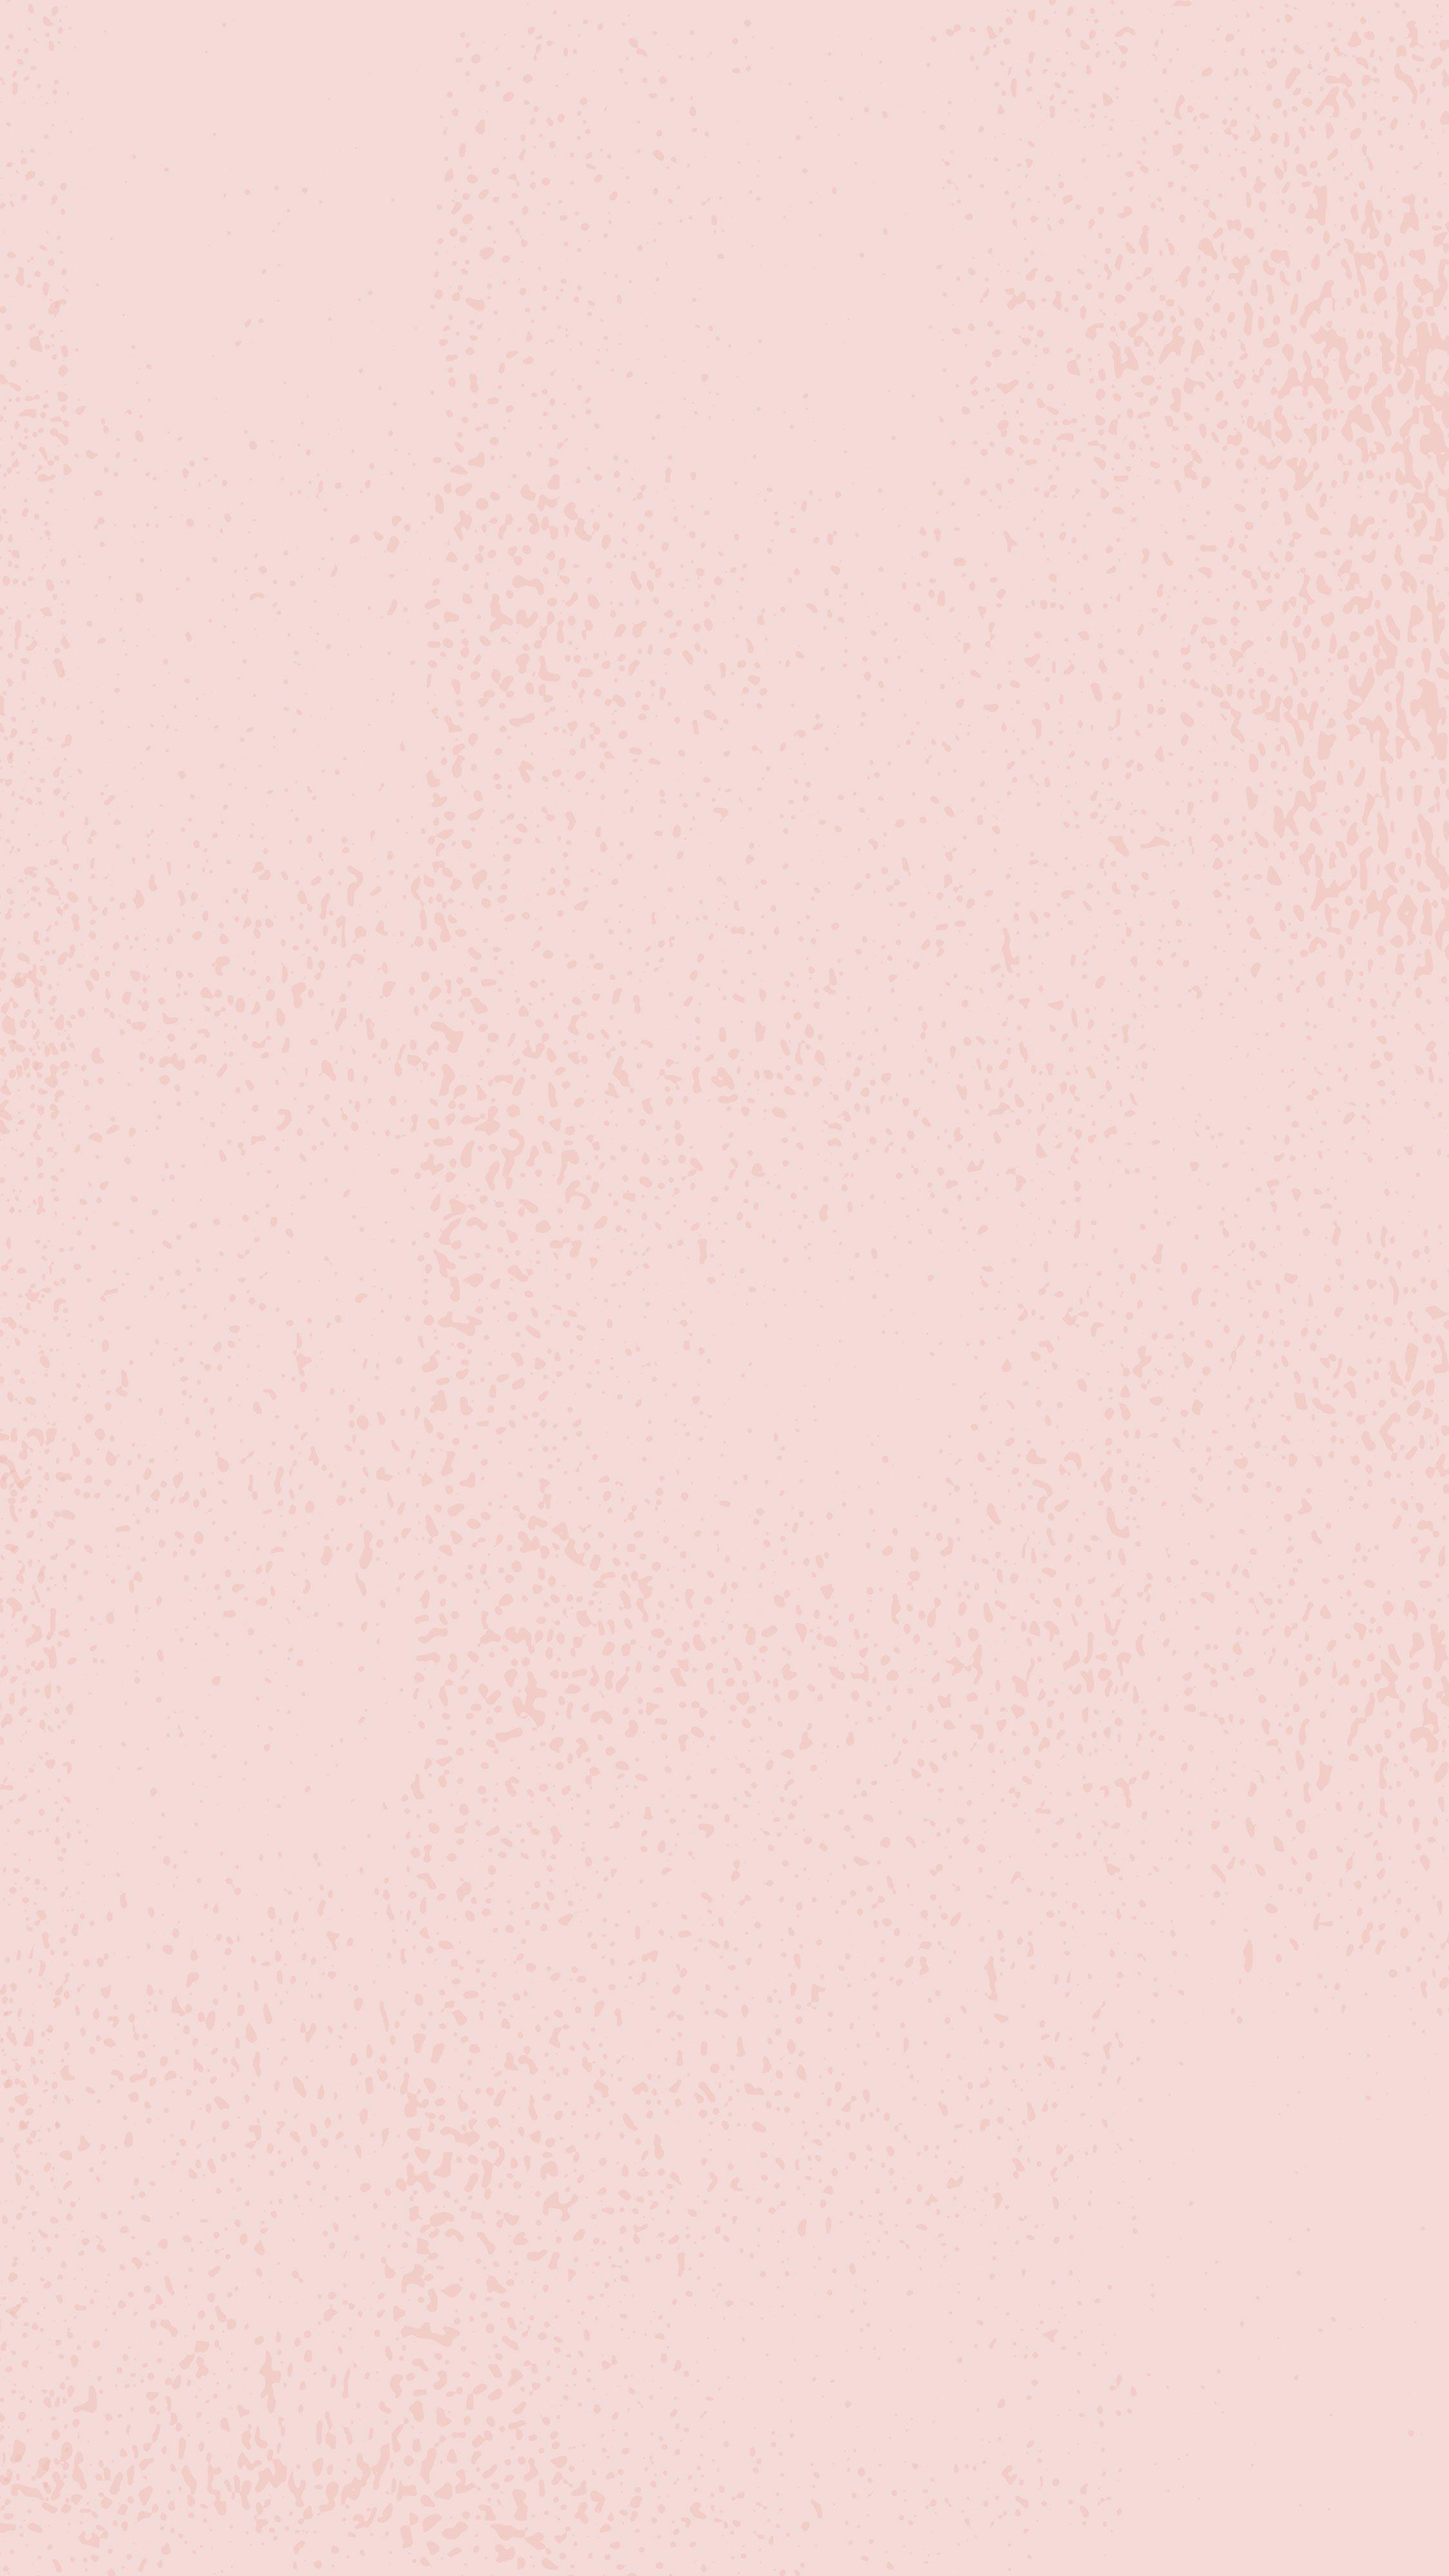 Wallpaper Warna Polos : wallpaper, warna, polos, Wallpapers, Polos, Wallpaper